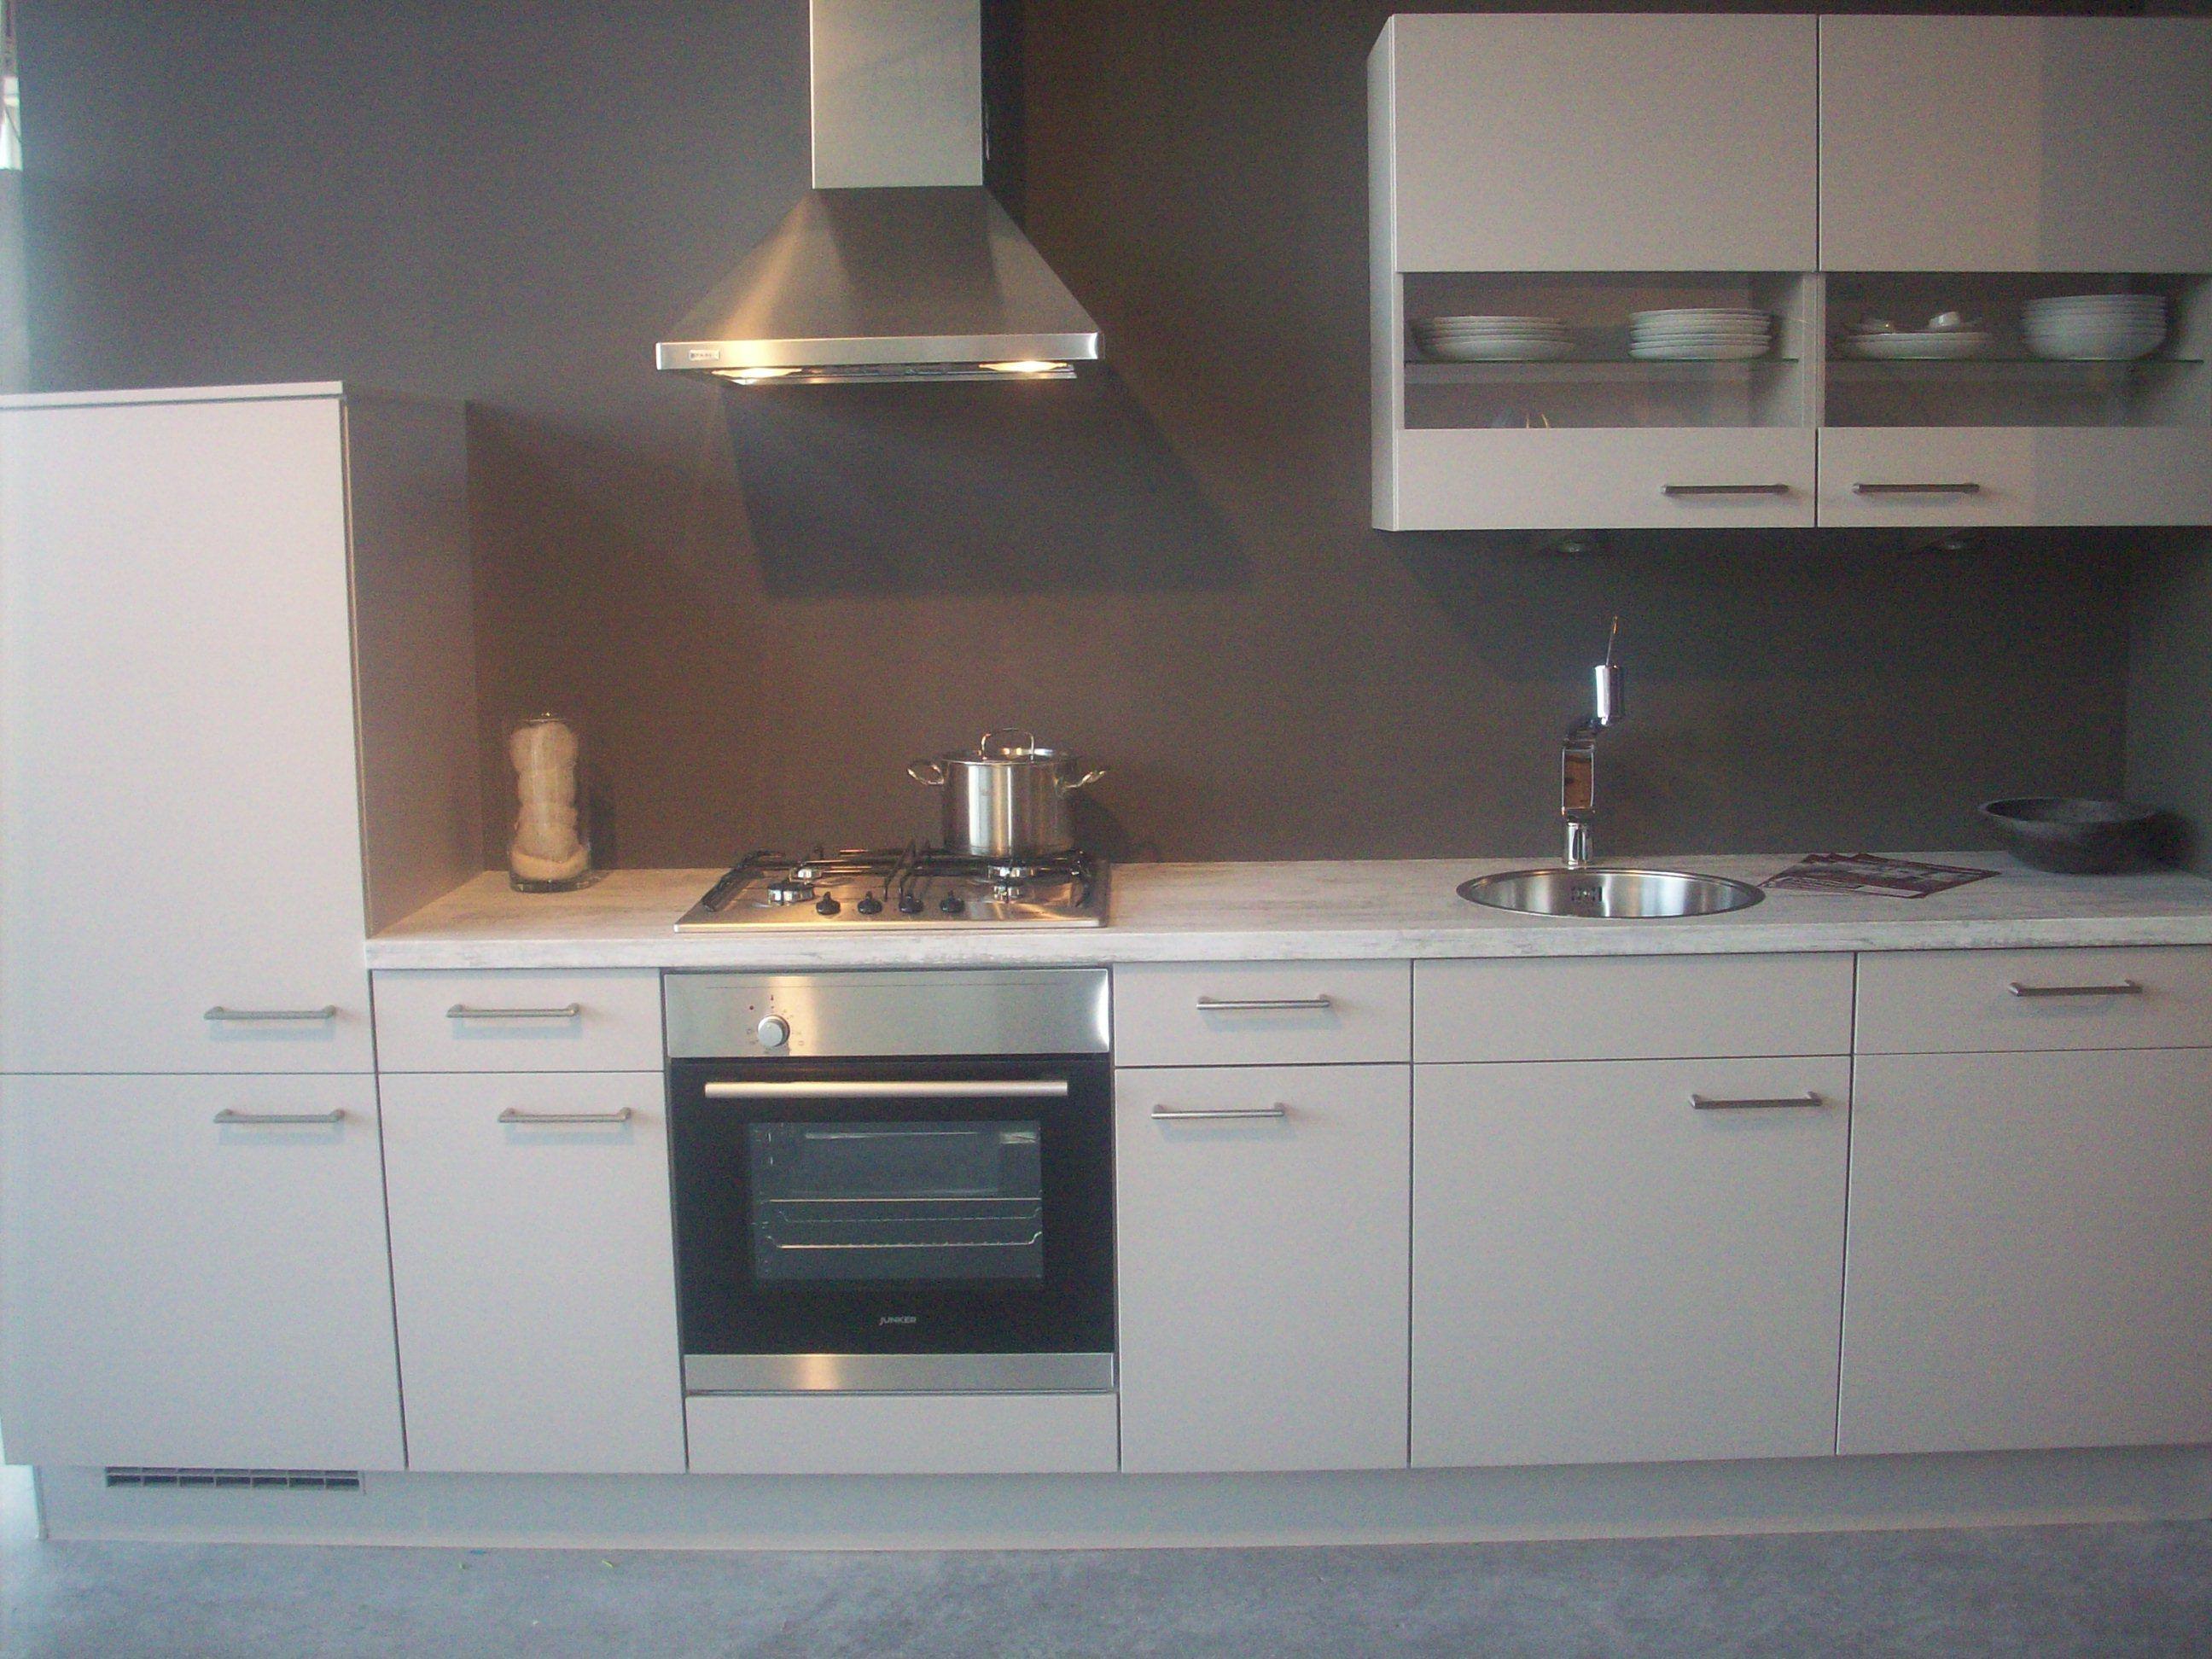 Moderne keuken 48514 - Afbeelding van moderne keuken ...